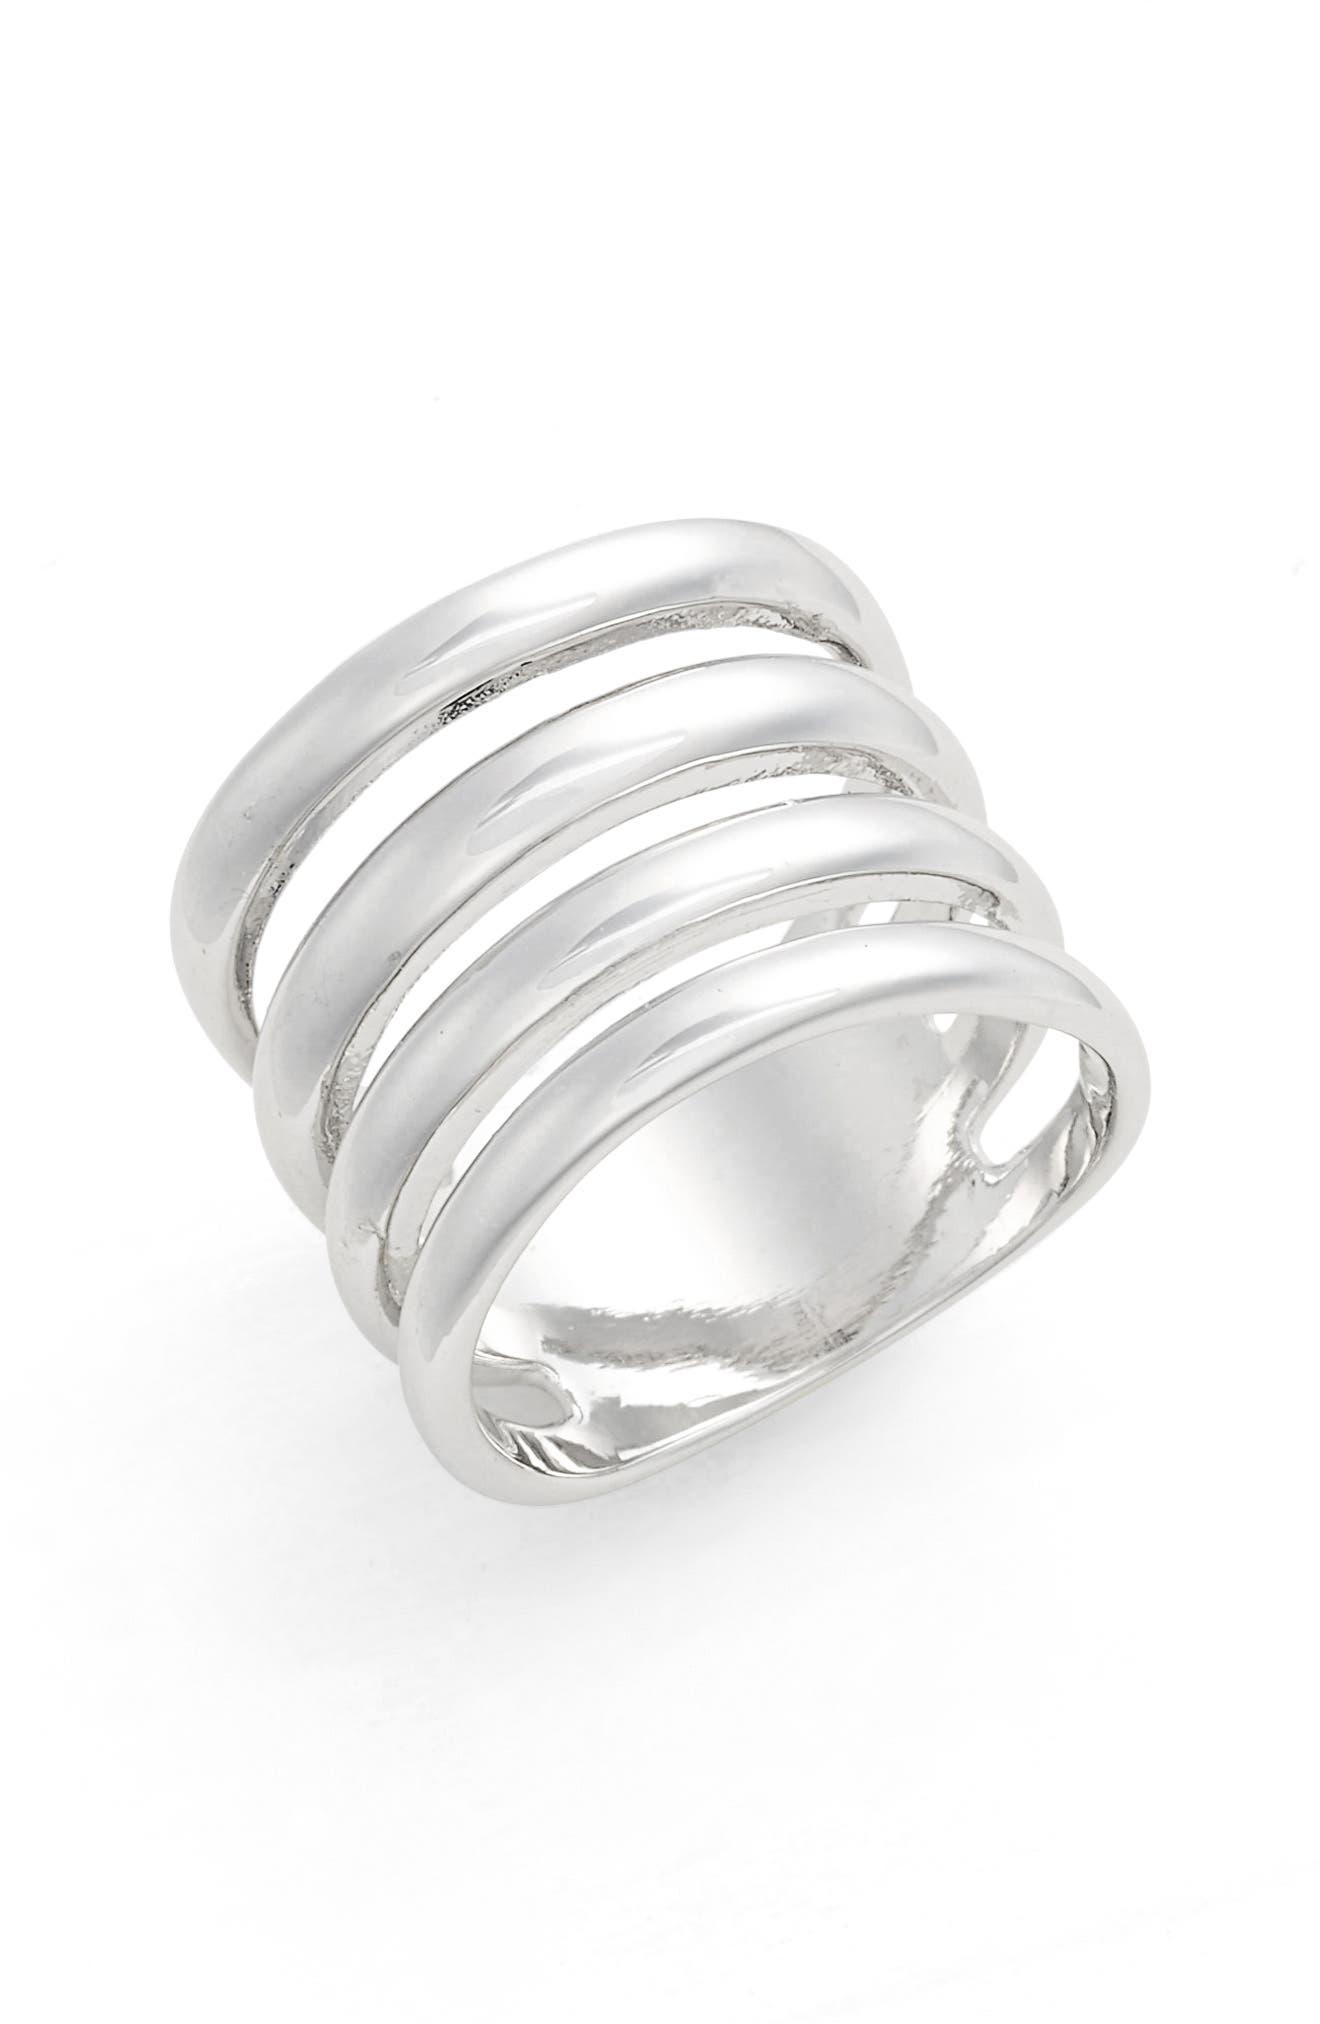 Alternate Image 1 Selected - Argento Vivo Openwork Ring